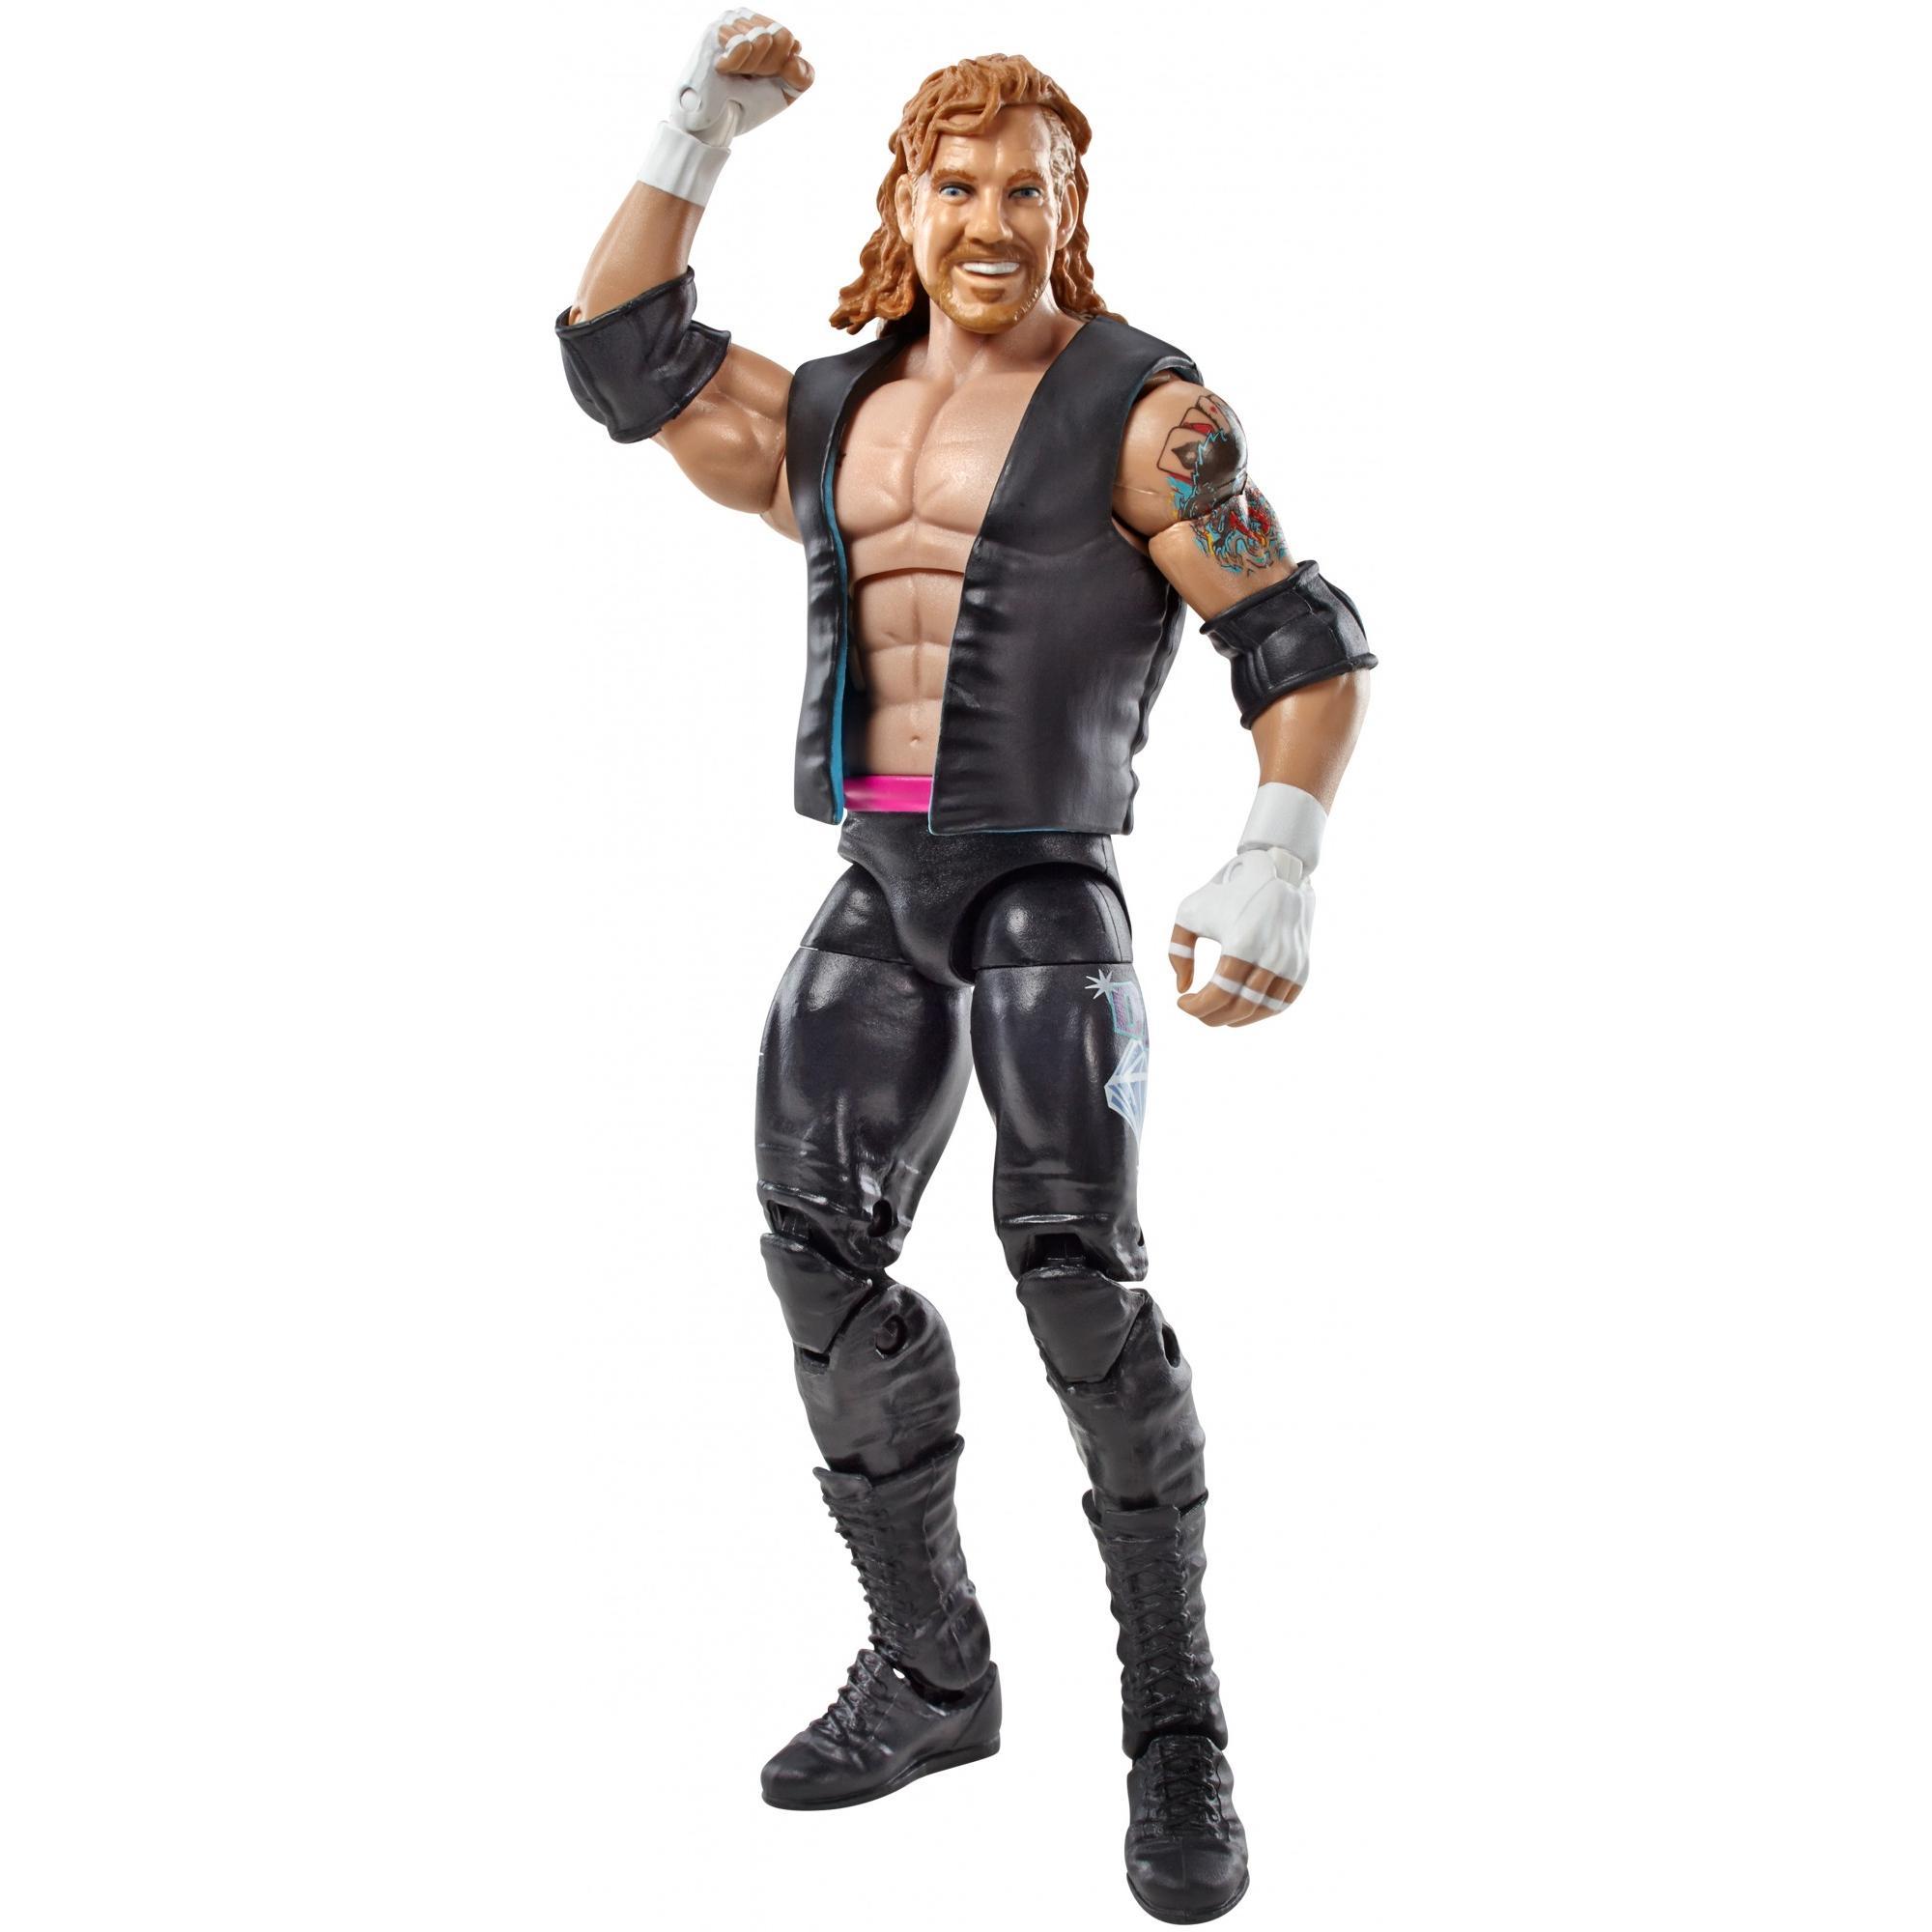 WWE Diamond Dallas Action Figure